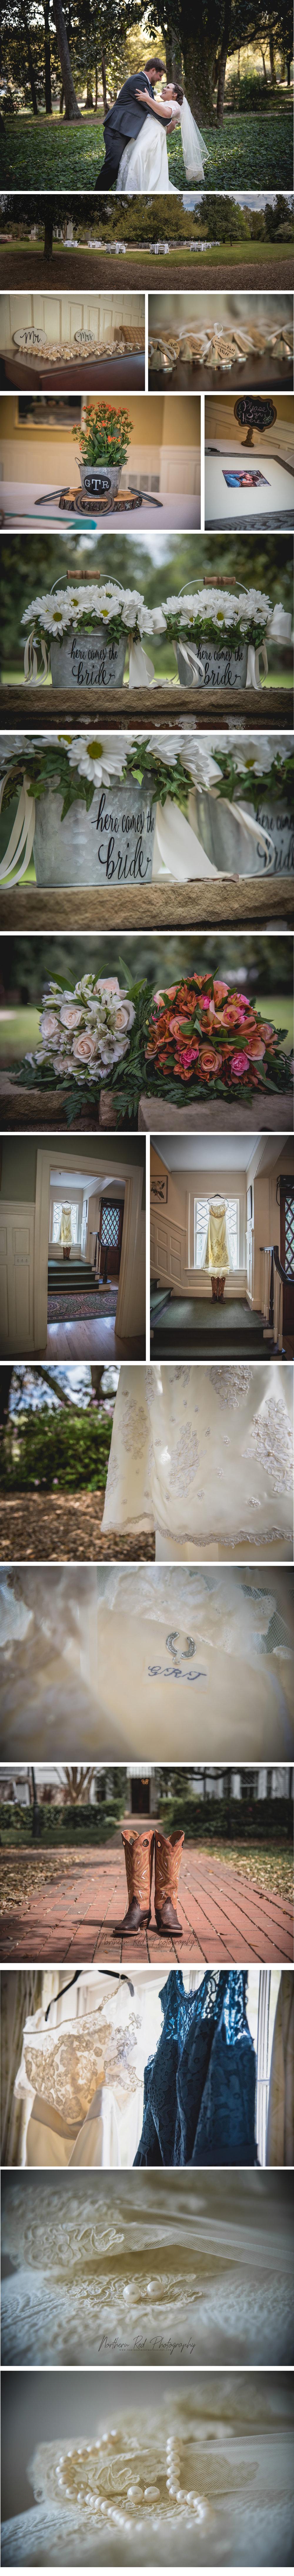 Hopelands Gardens Wedding Photographer Aiken South Carolina